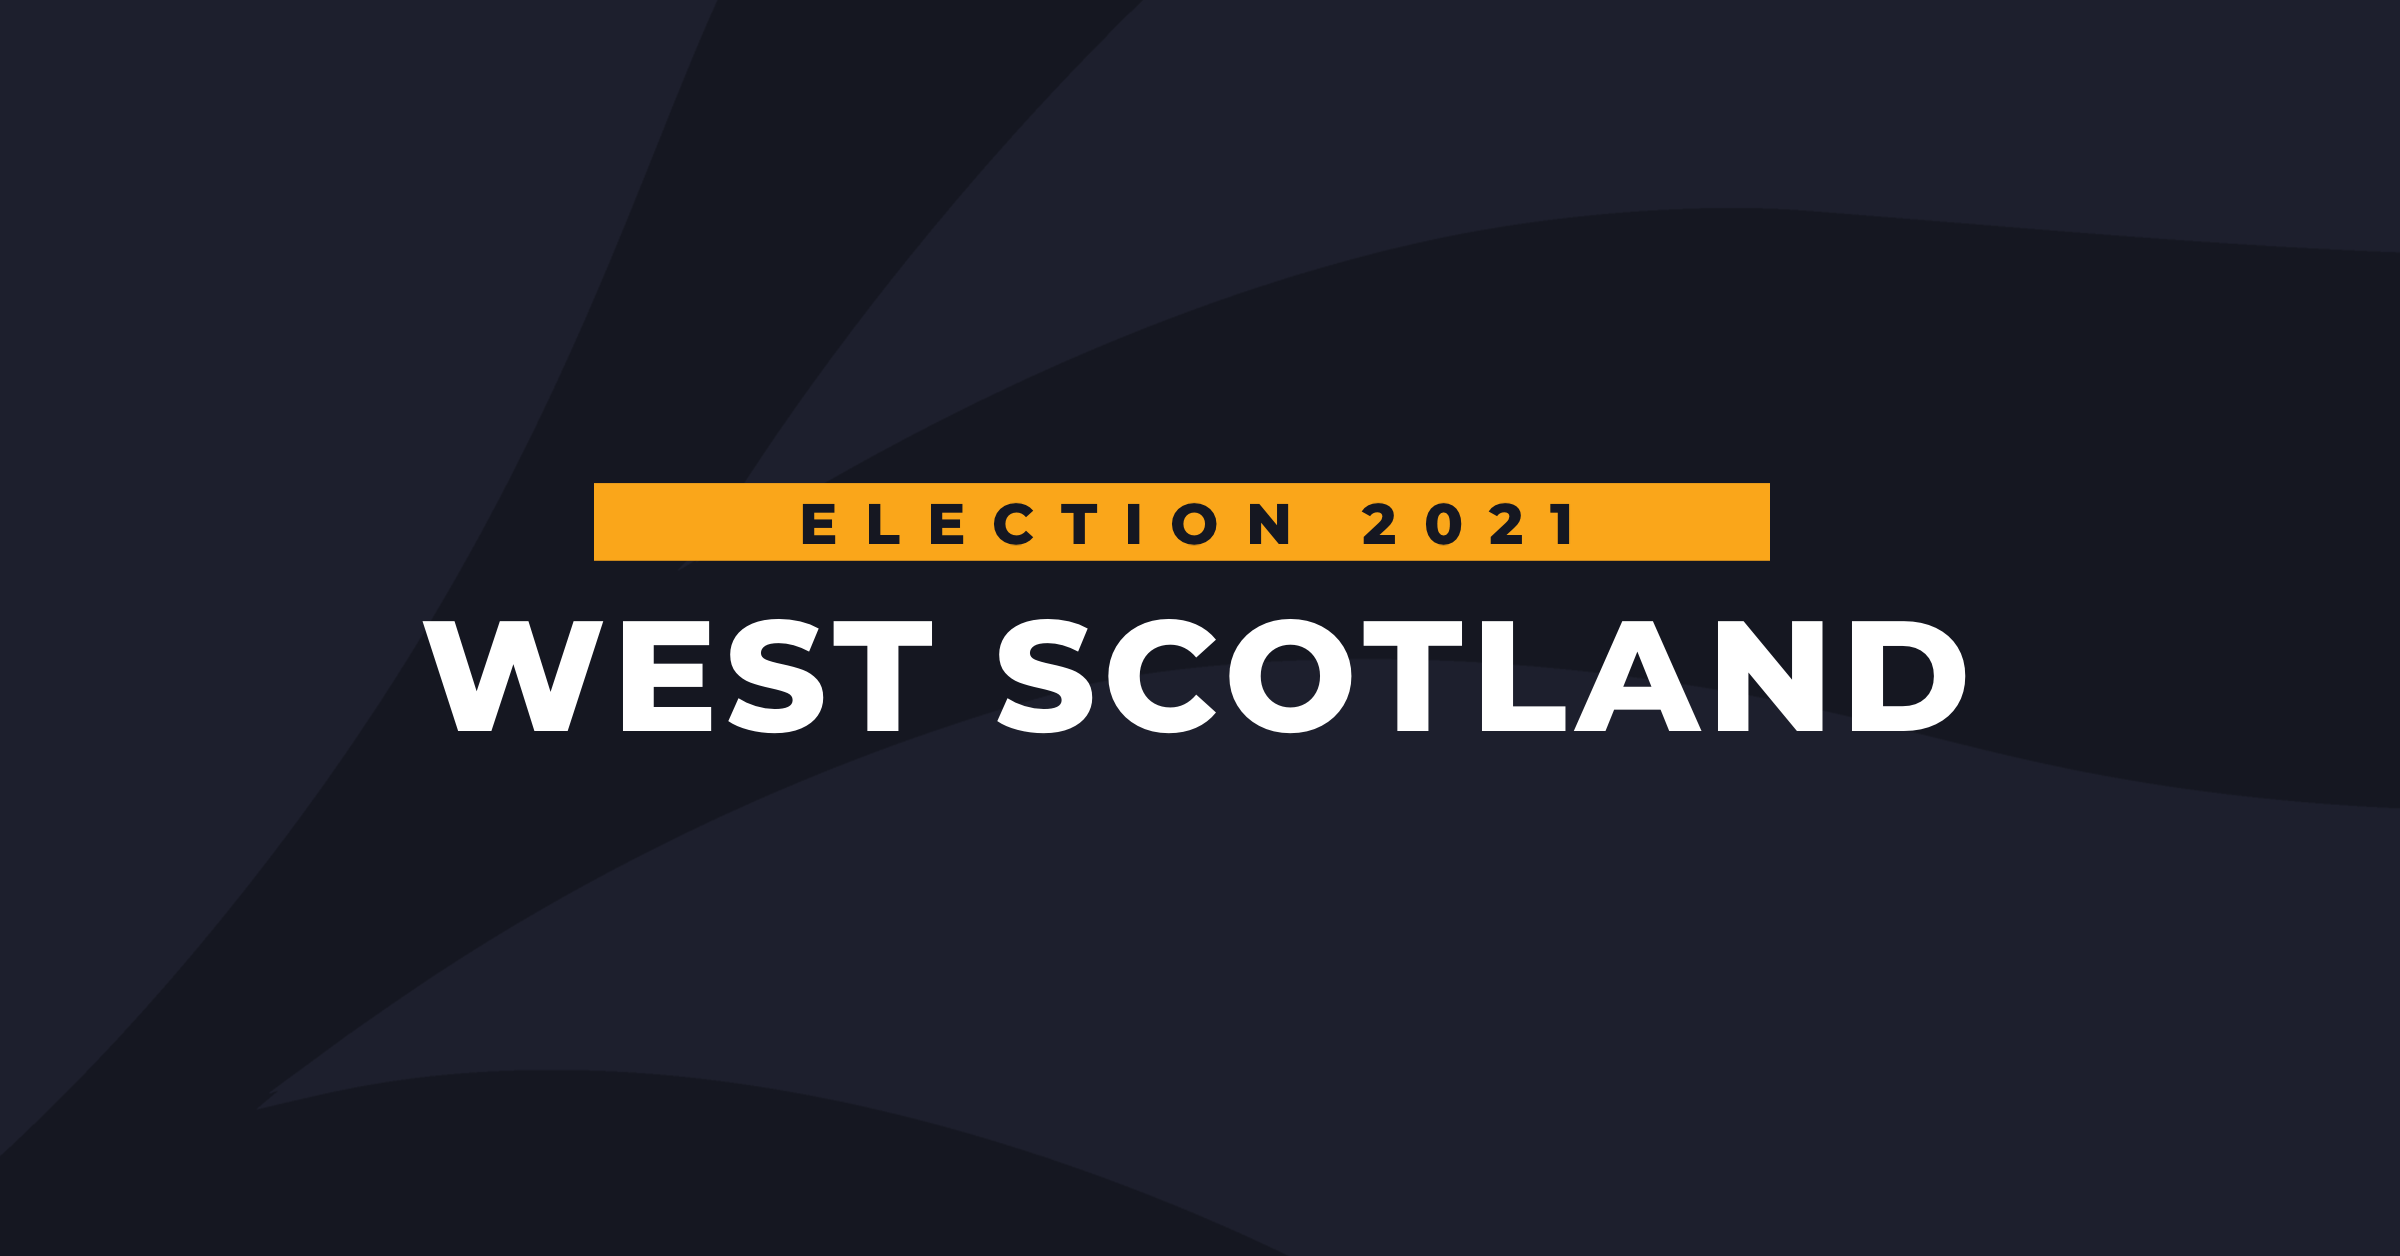 West Scotland